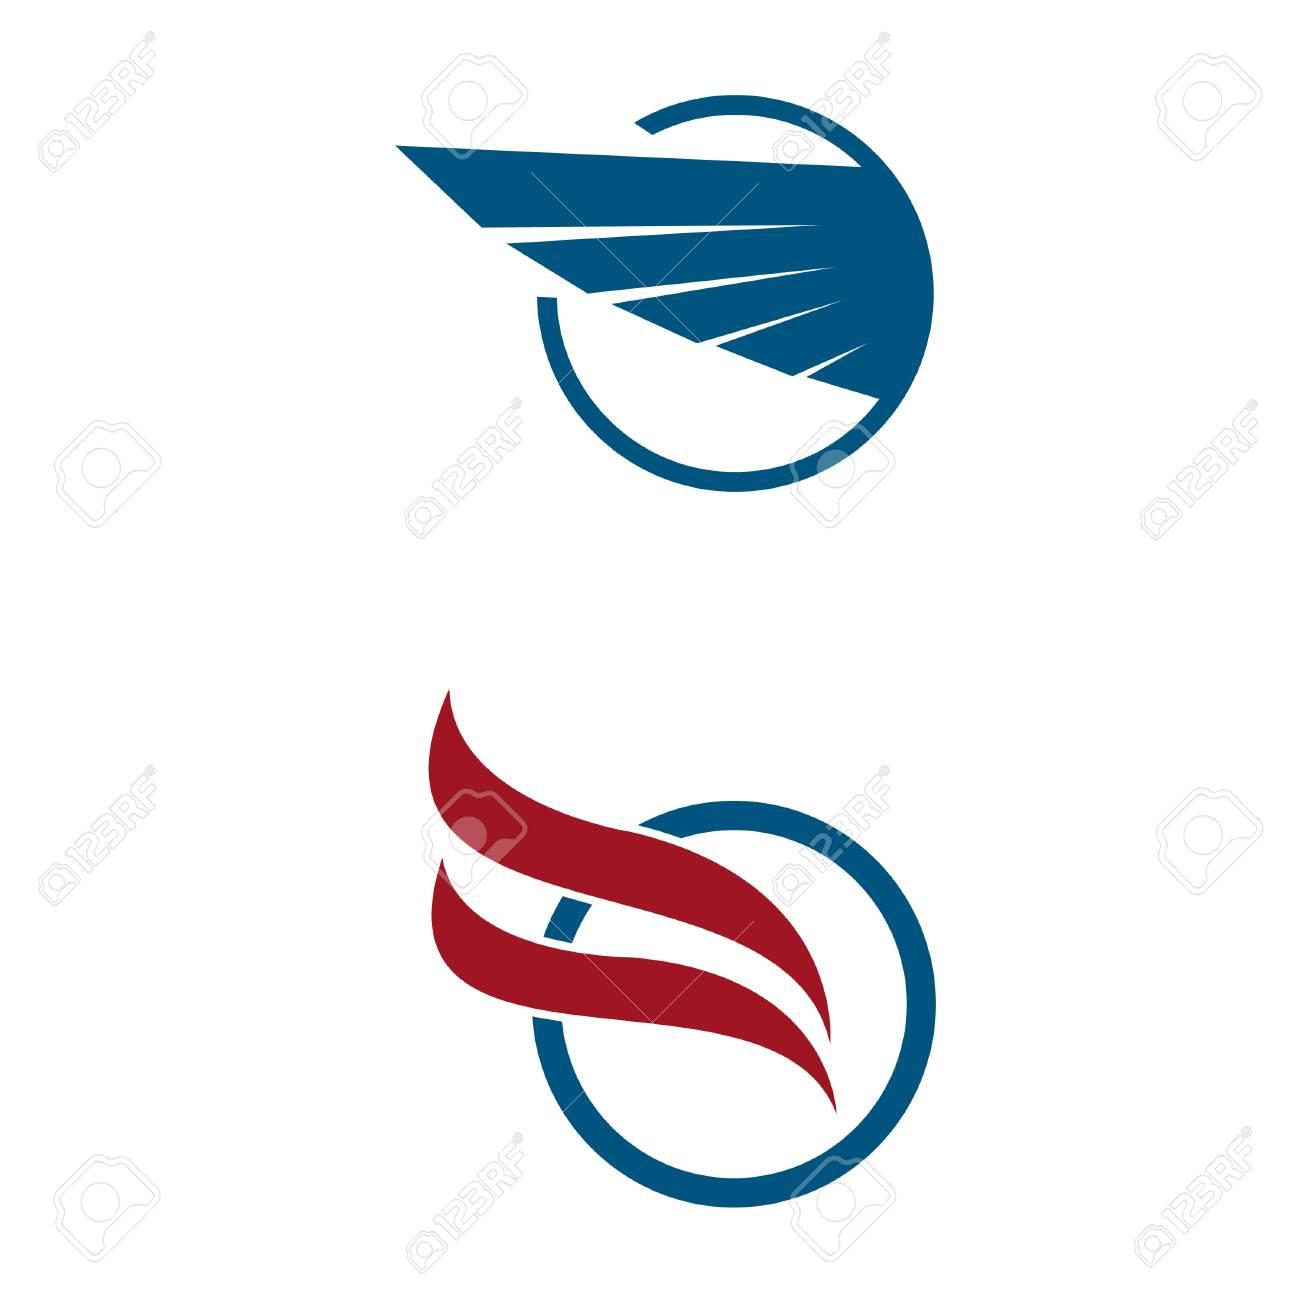 Aviation company emblem vector logo design  Airplane logo  Tickets